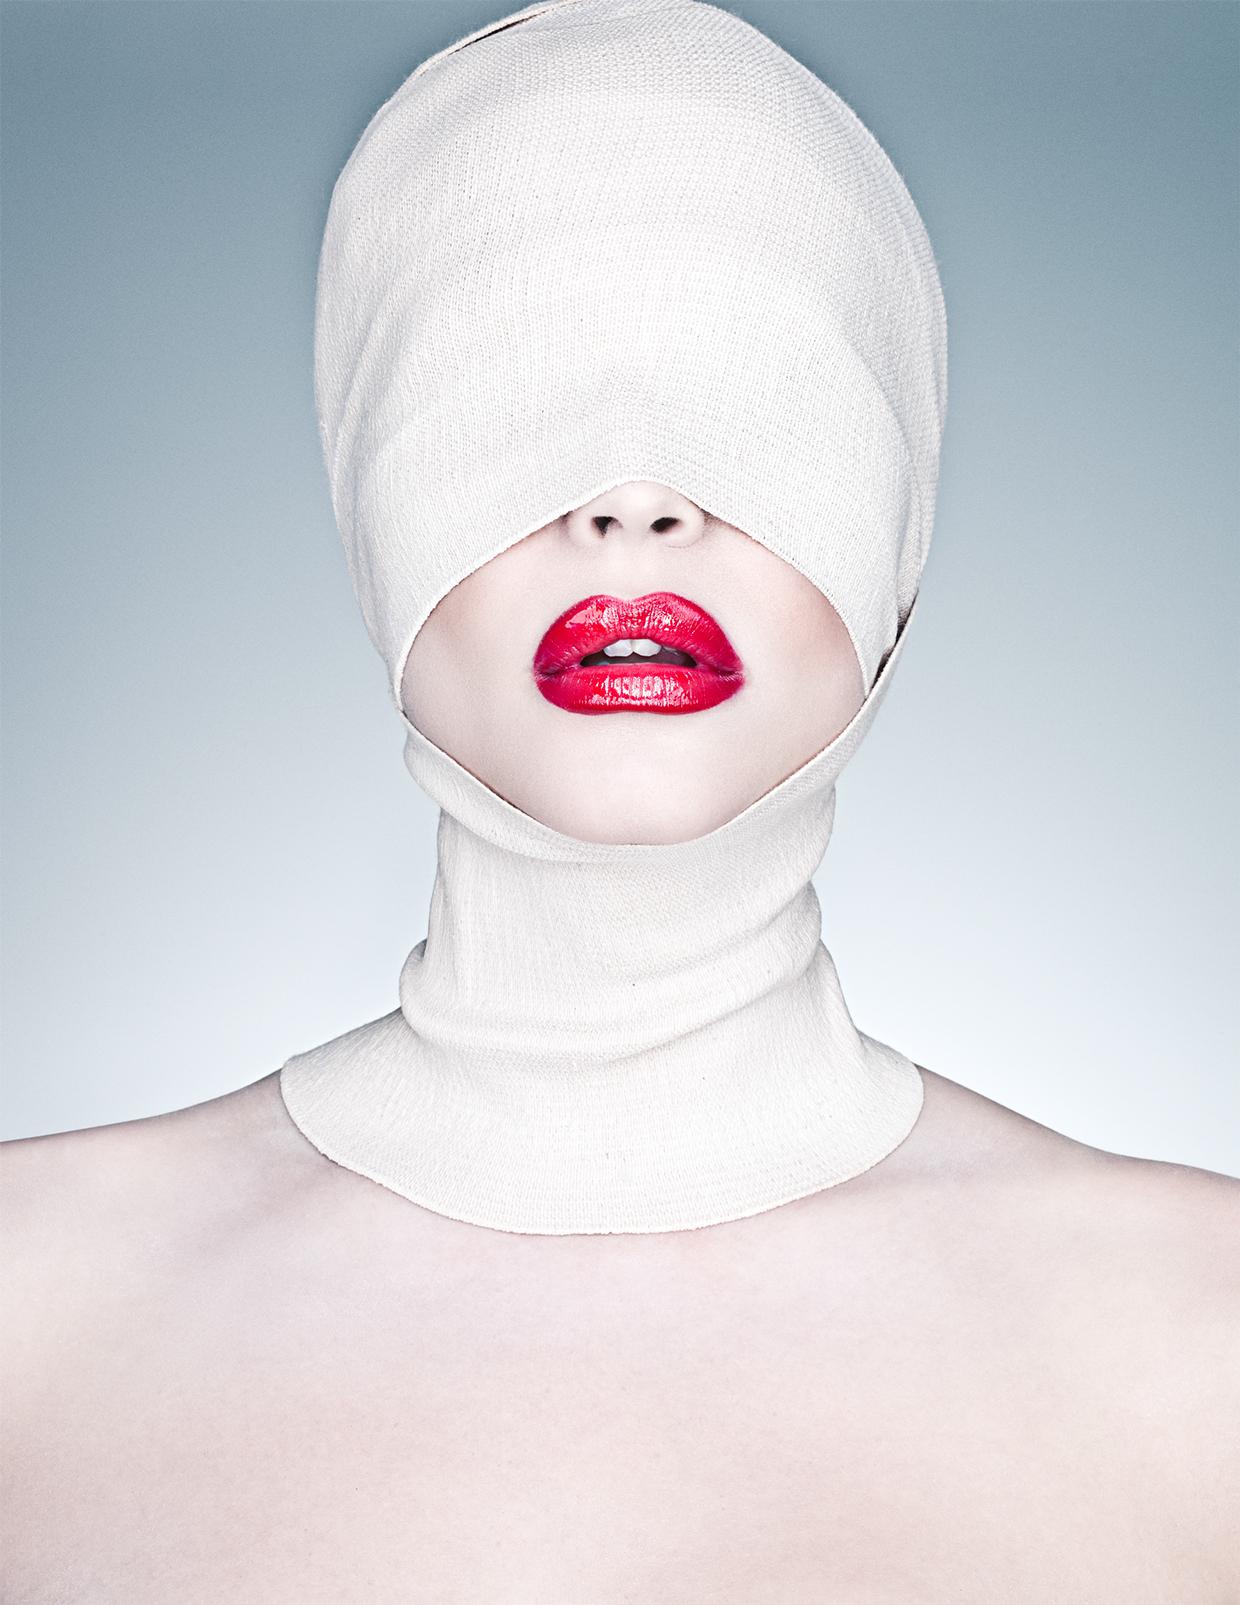 Cold Blood by David Benoliel